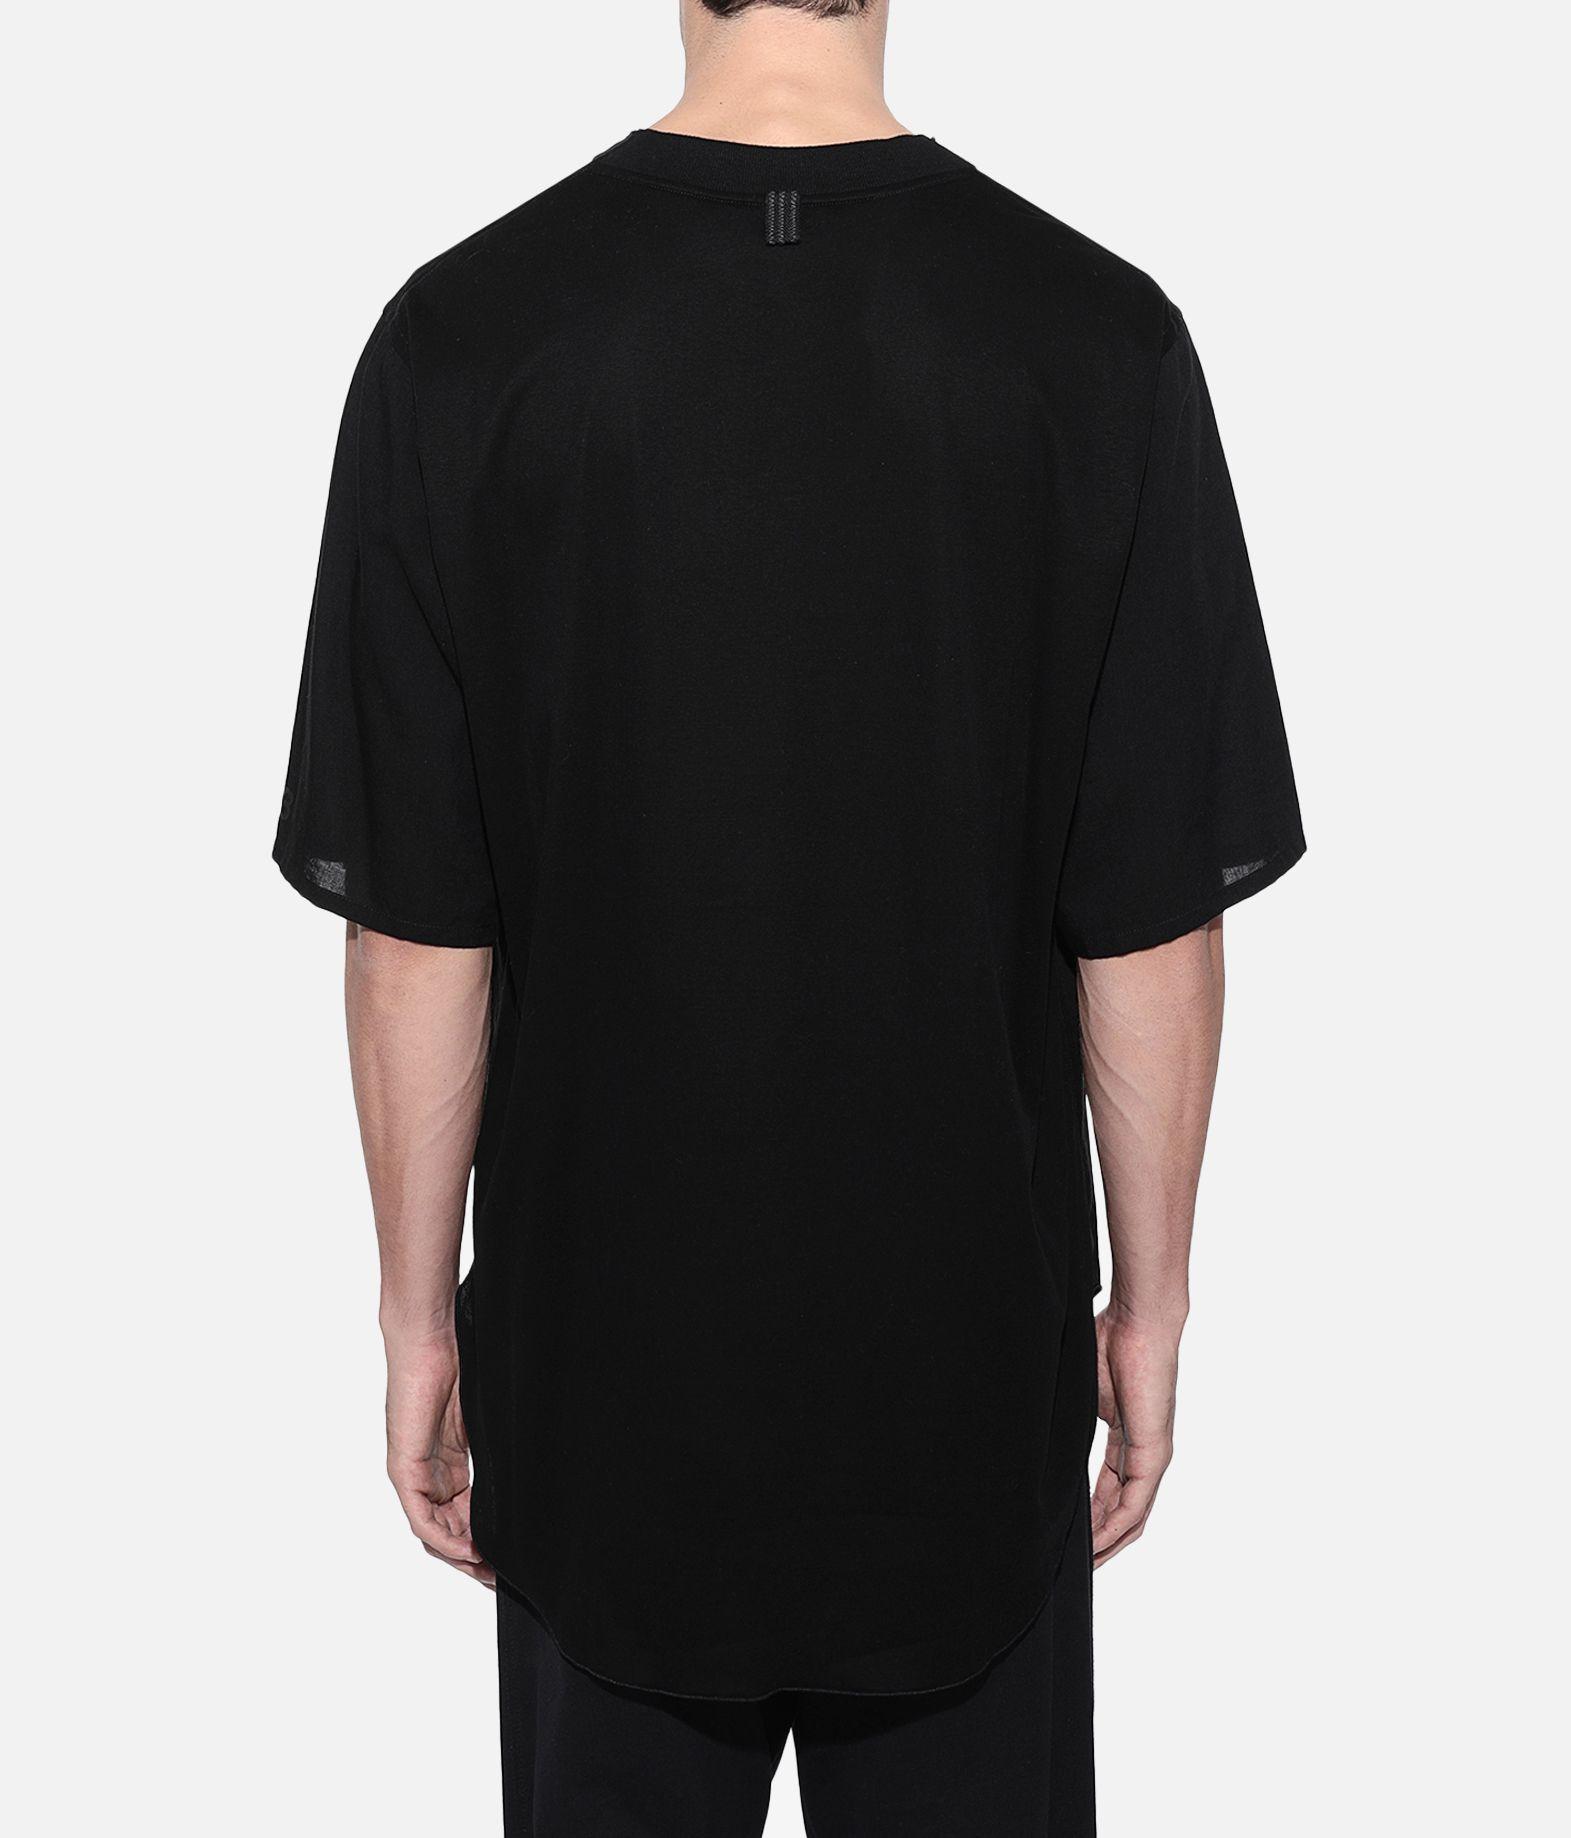 Y-3 Y-3 Long Tee  T-shirt maniche corte Uomo e